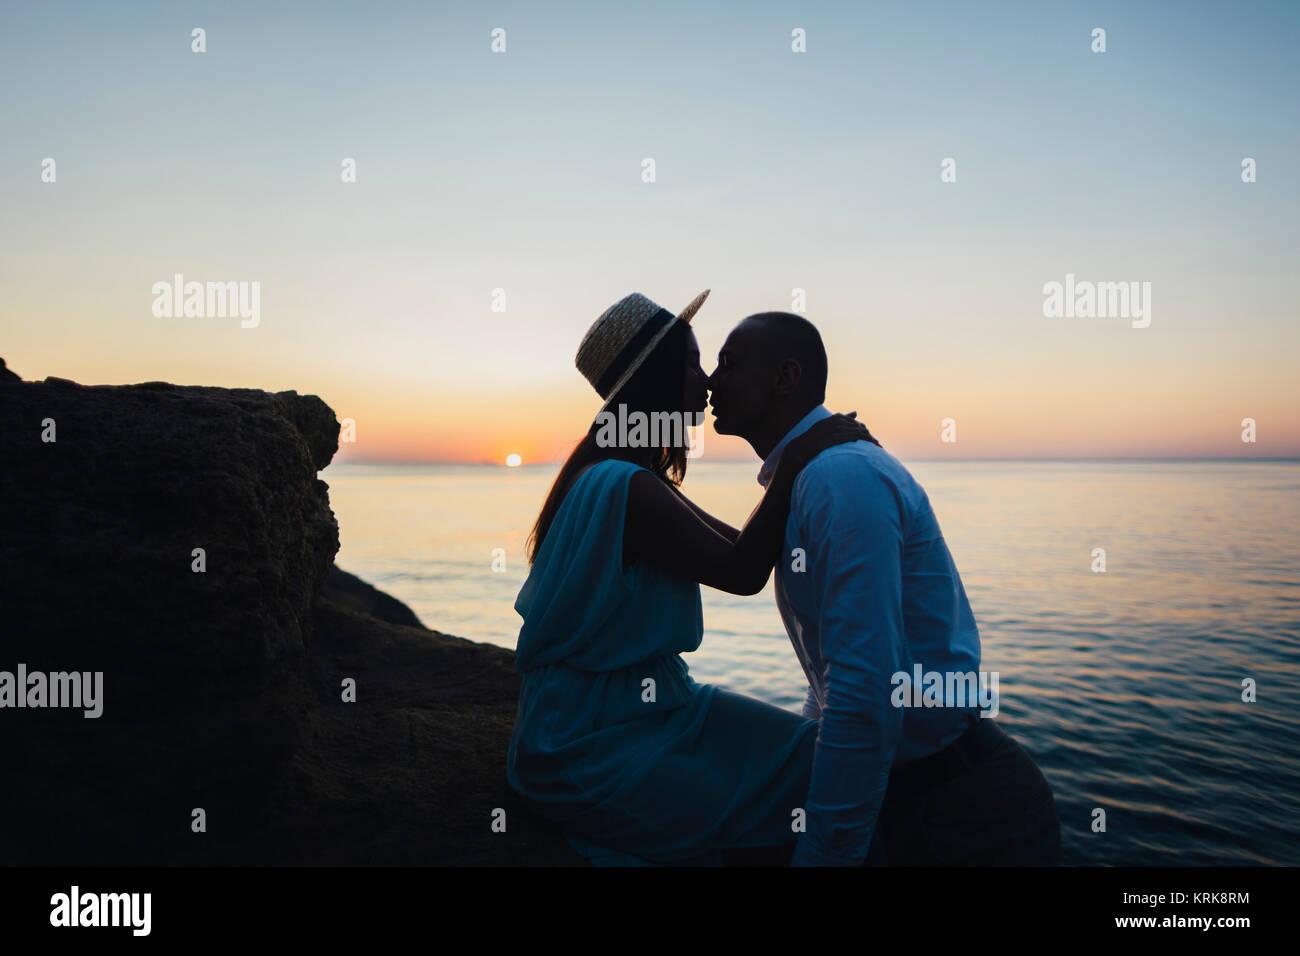 Caucasian couple kissing on rock near ocean at sunset - Stock Image